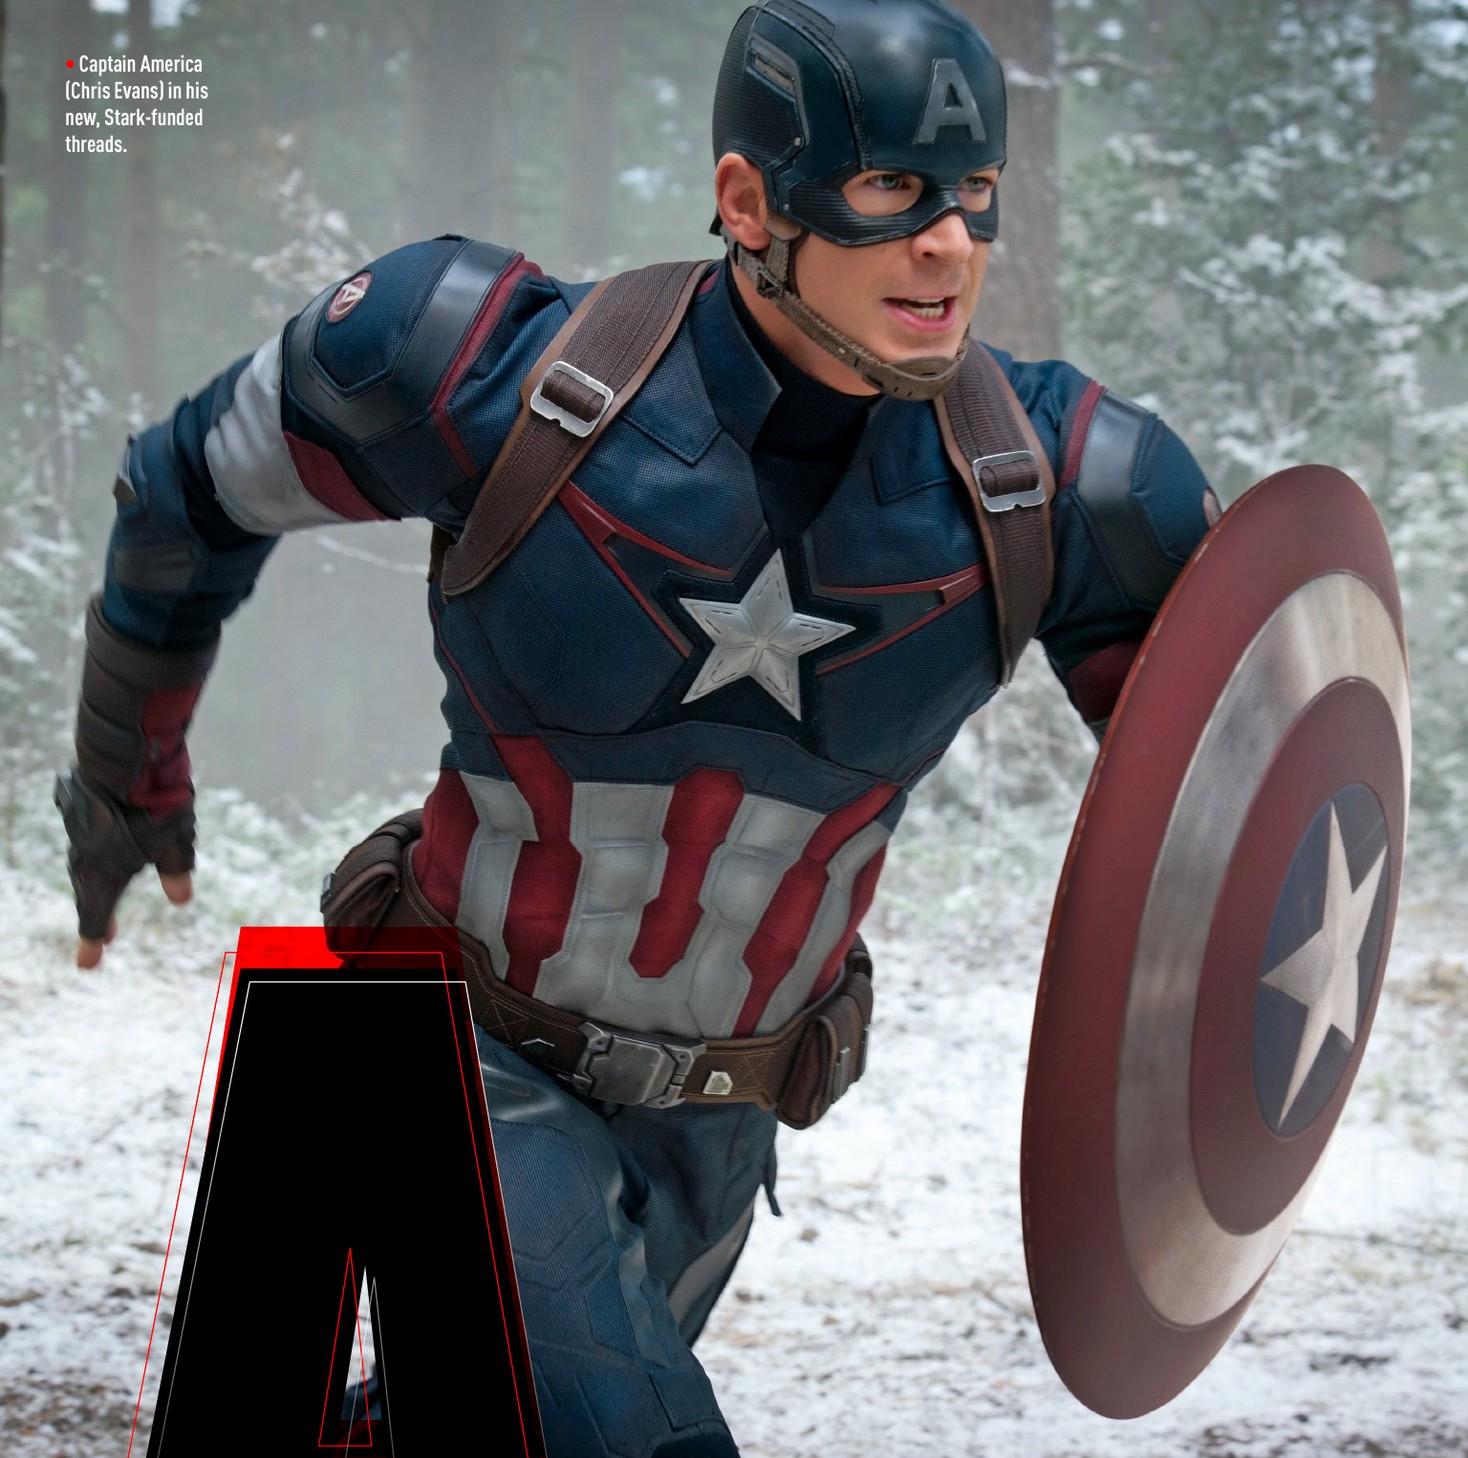 http://screenrant.com/wp-content/uploads/avengers-age-ultron-captain-america-costume.jpg